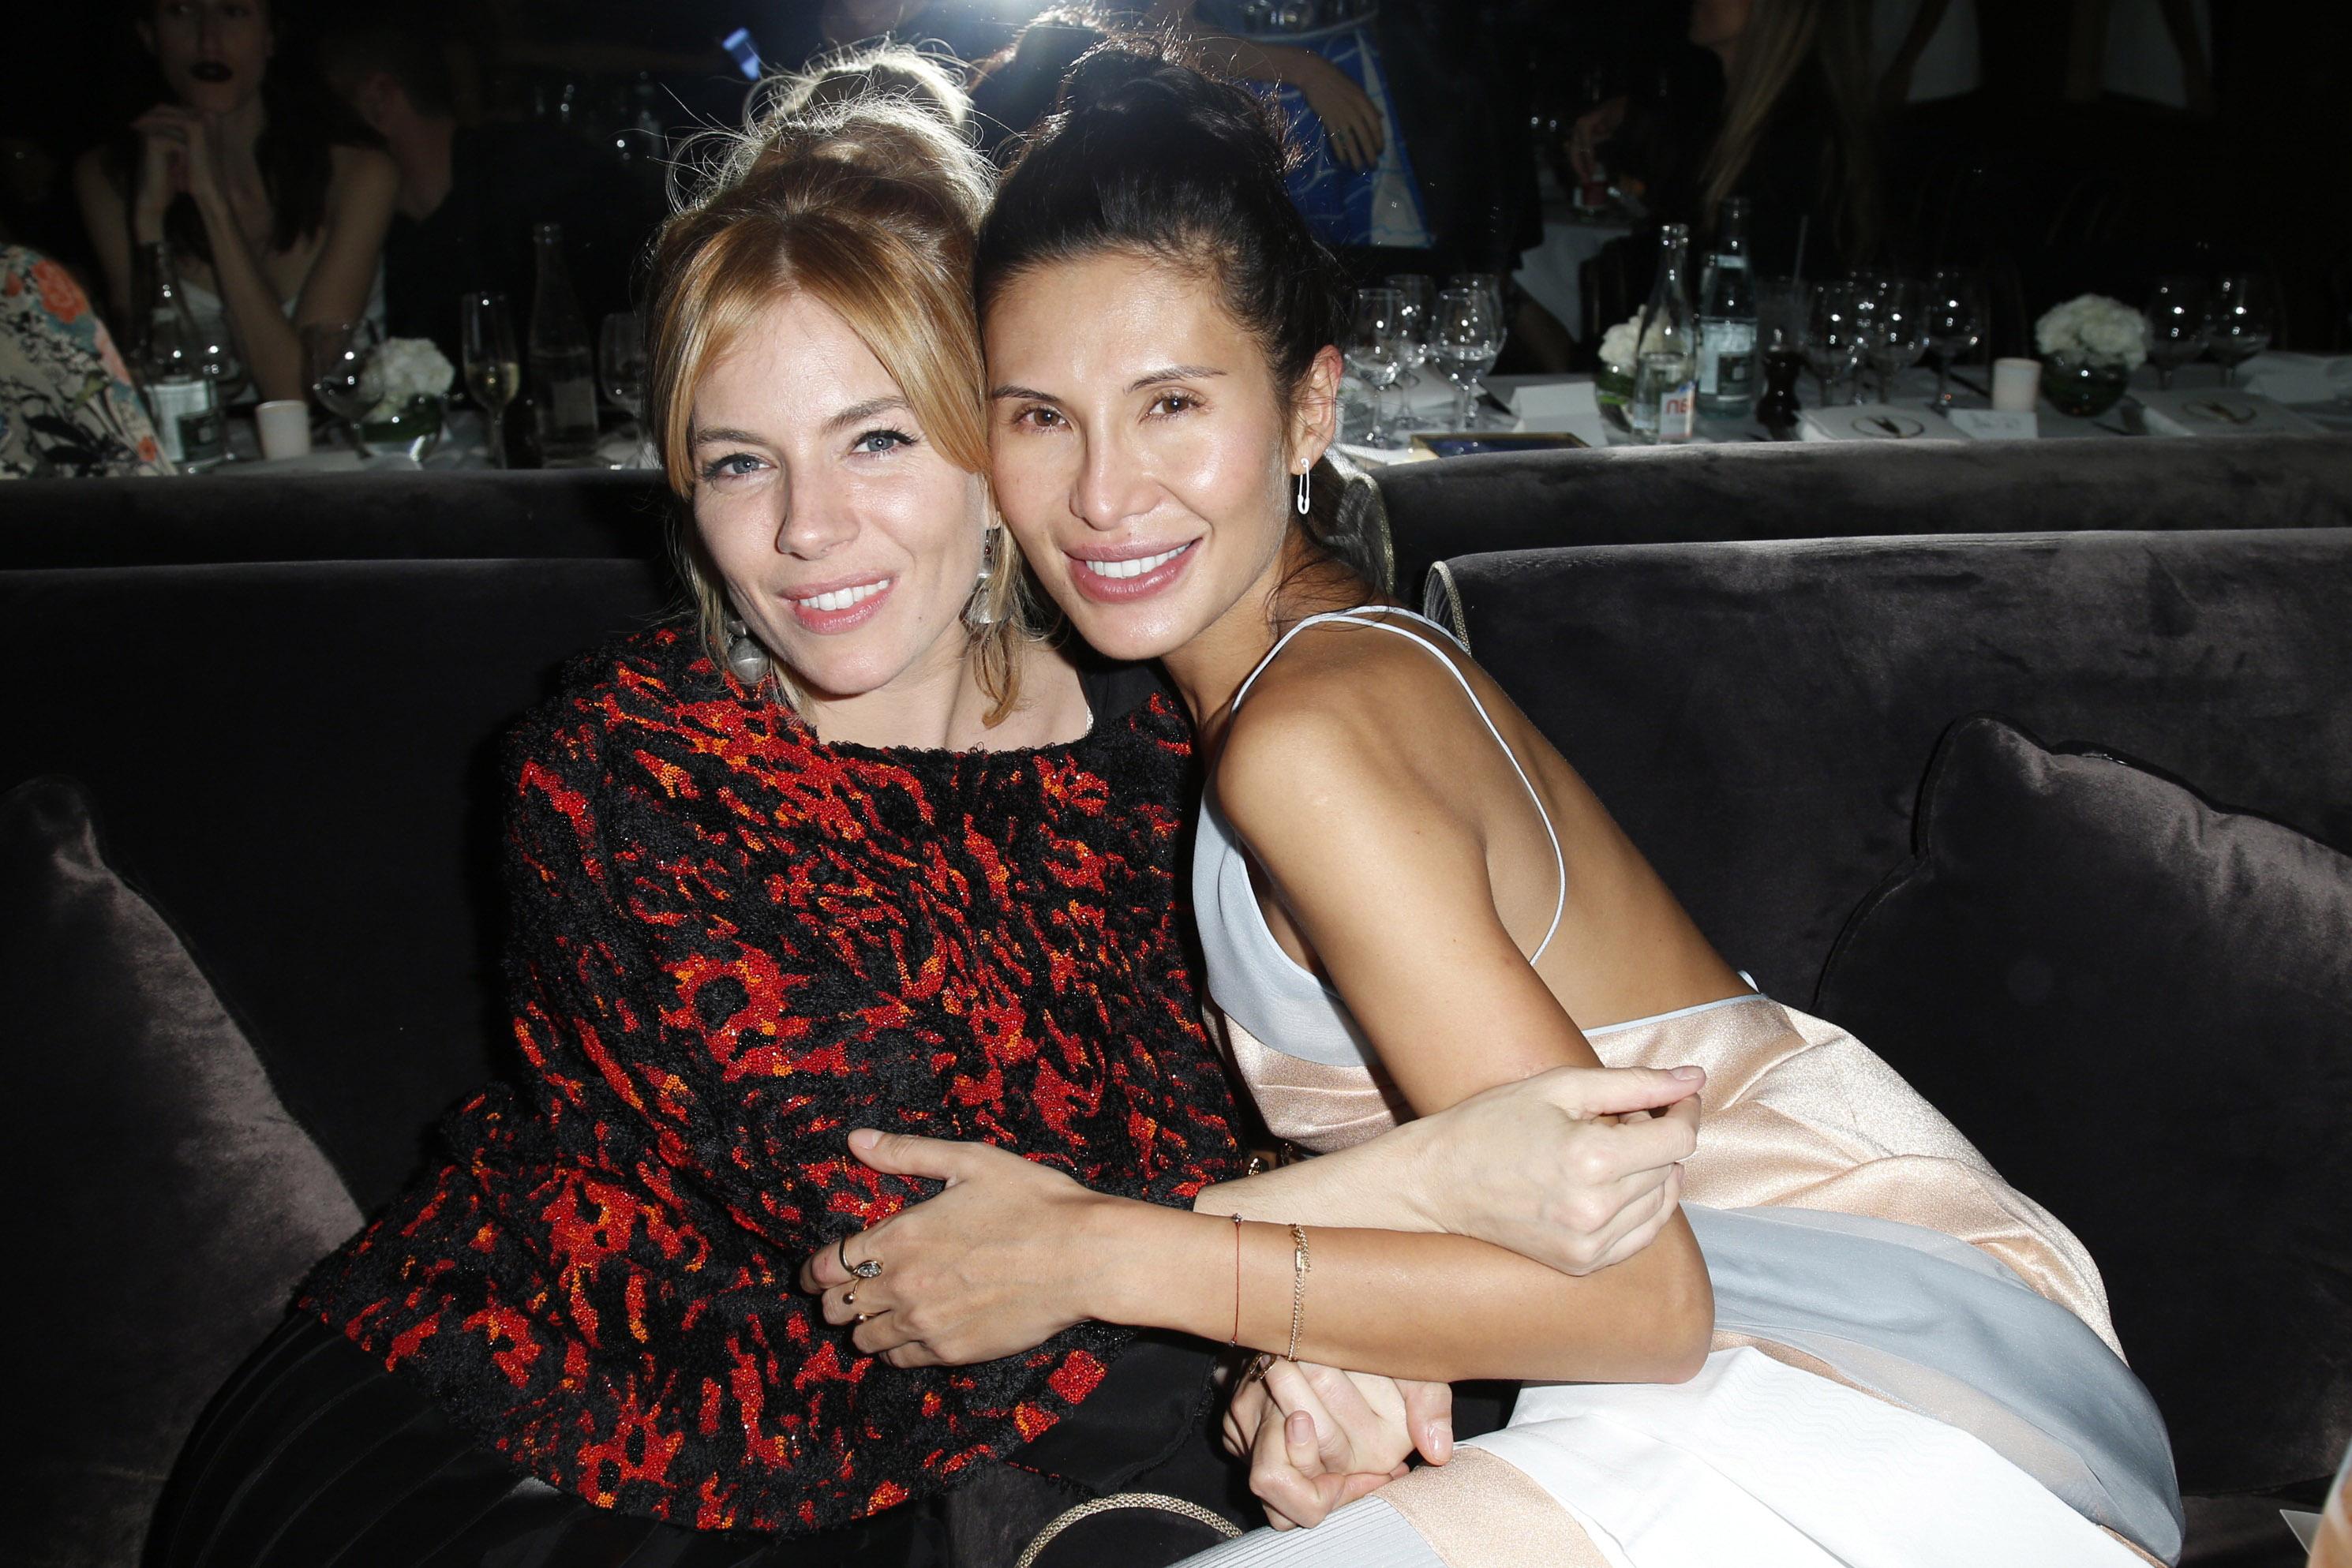 Sienna Miller and Goga Ashkenazi Vionnet Paris Fashion Week Dinner 2015